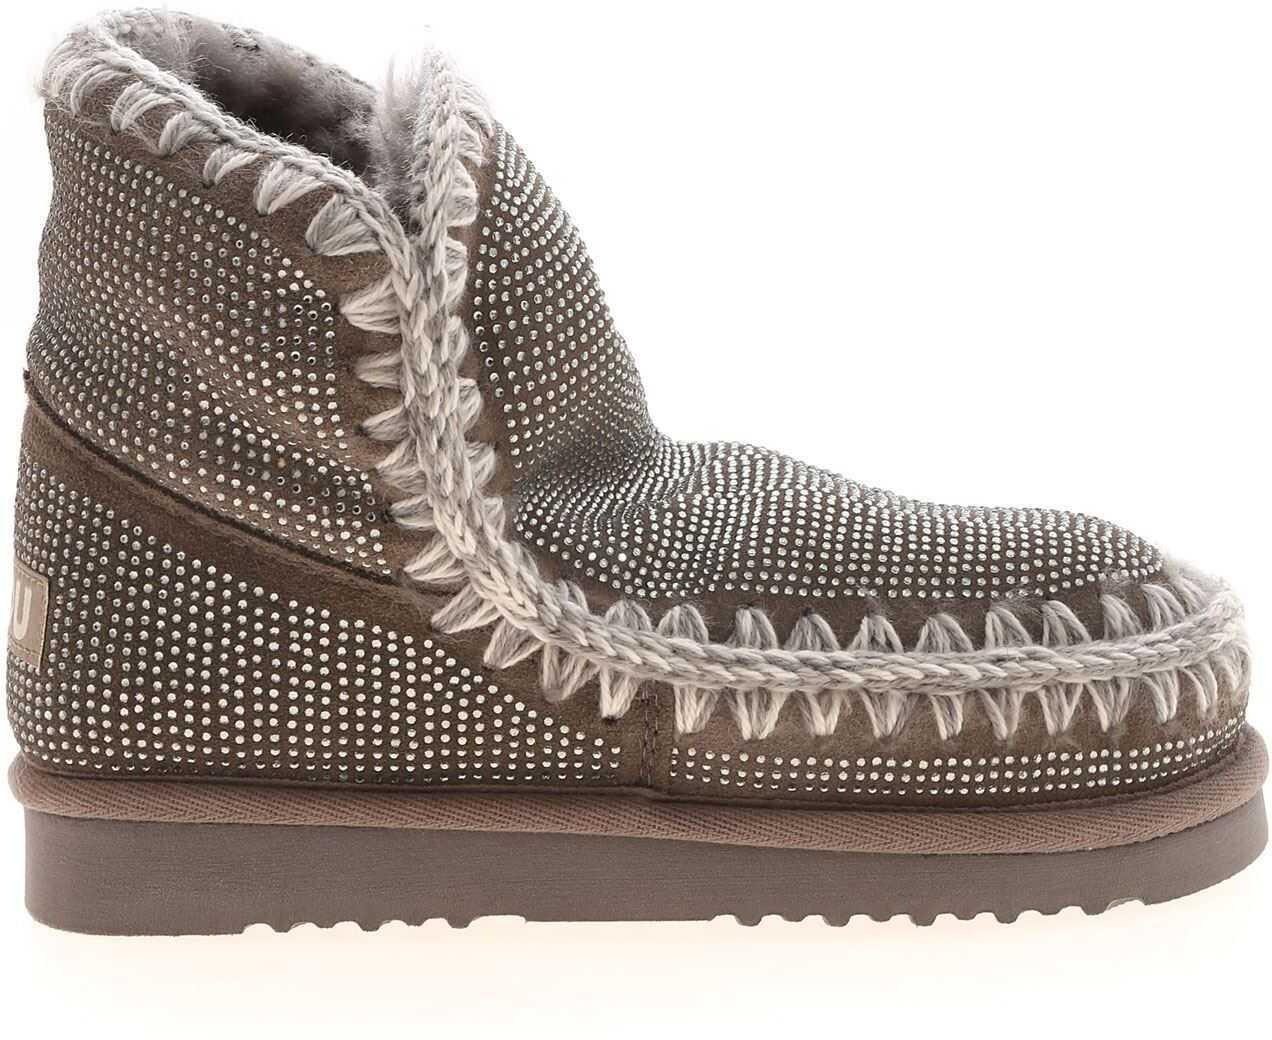 Mou Eskimo 18 Full Sneakers In Grey MU.FW101039A NGRE Grey imagine b-mall.ro